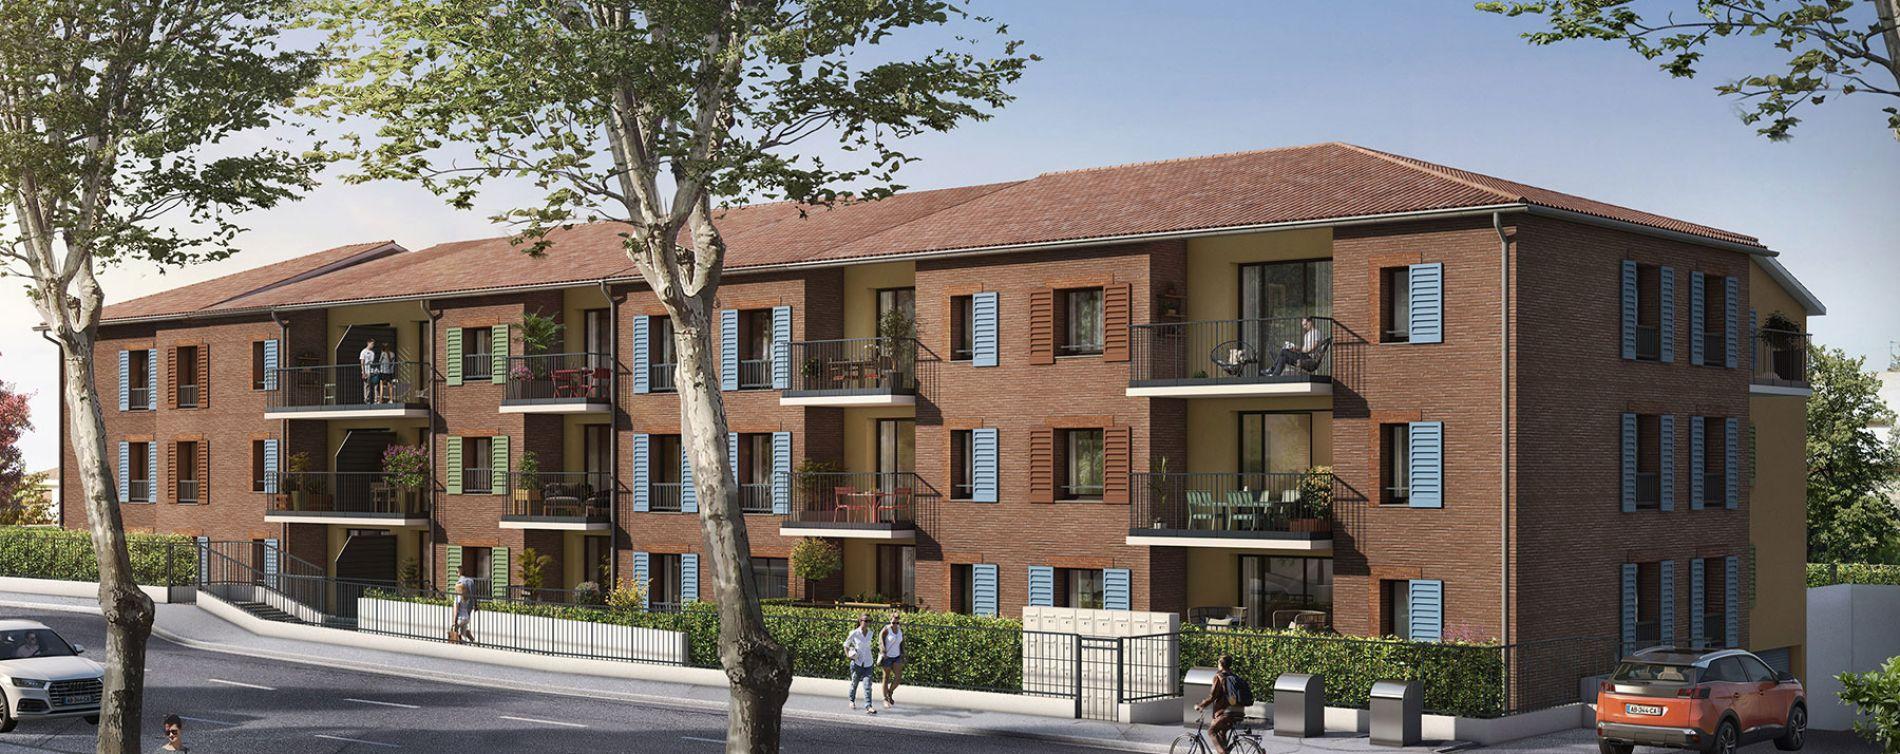 Résidence Bella Ciutat à Castanet-Tolosan